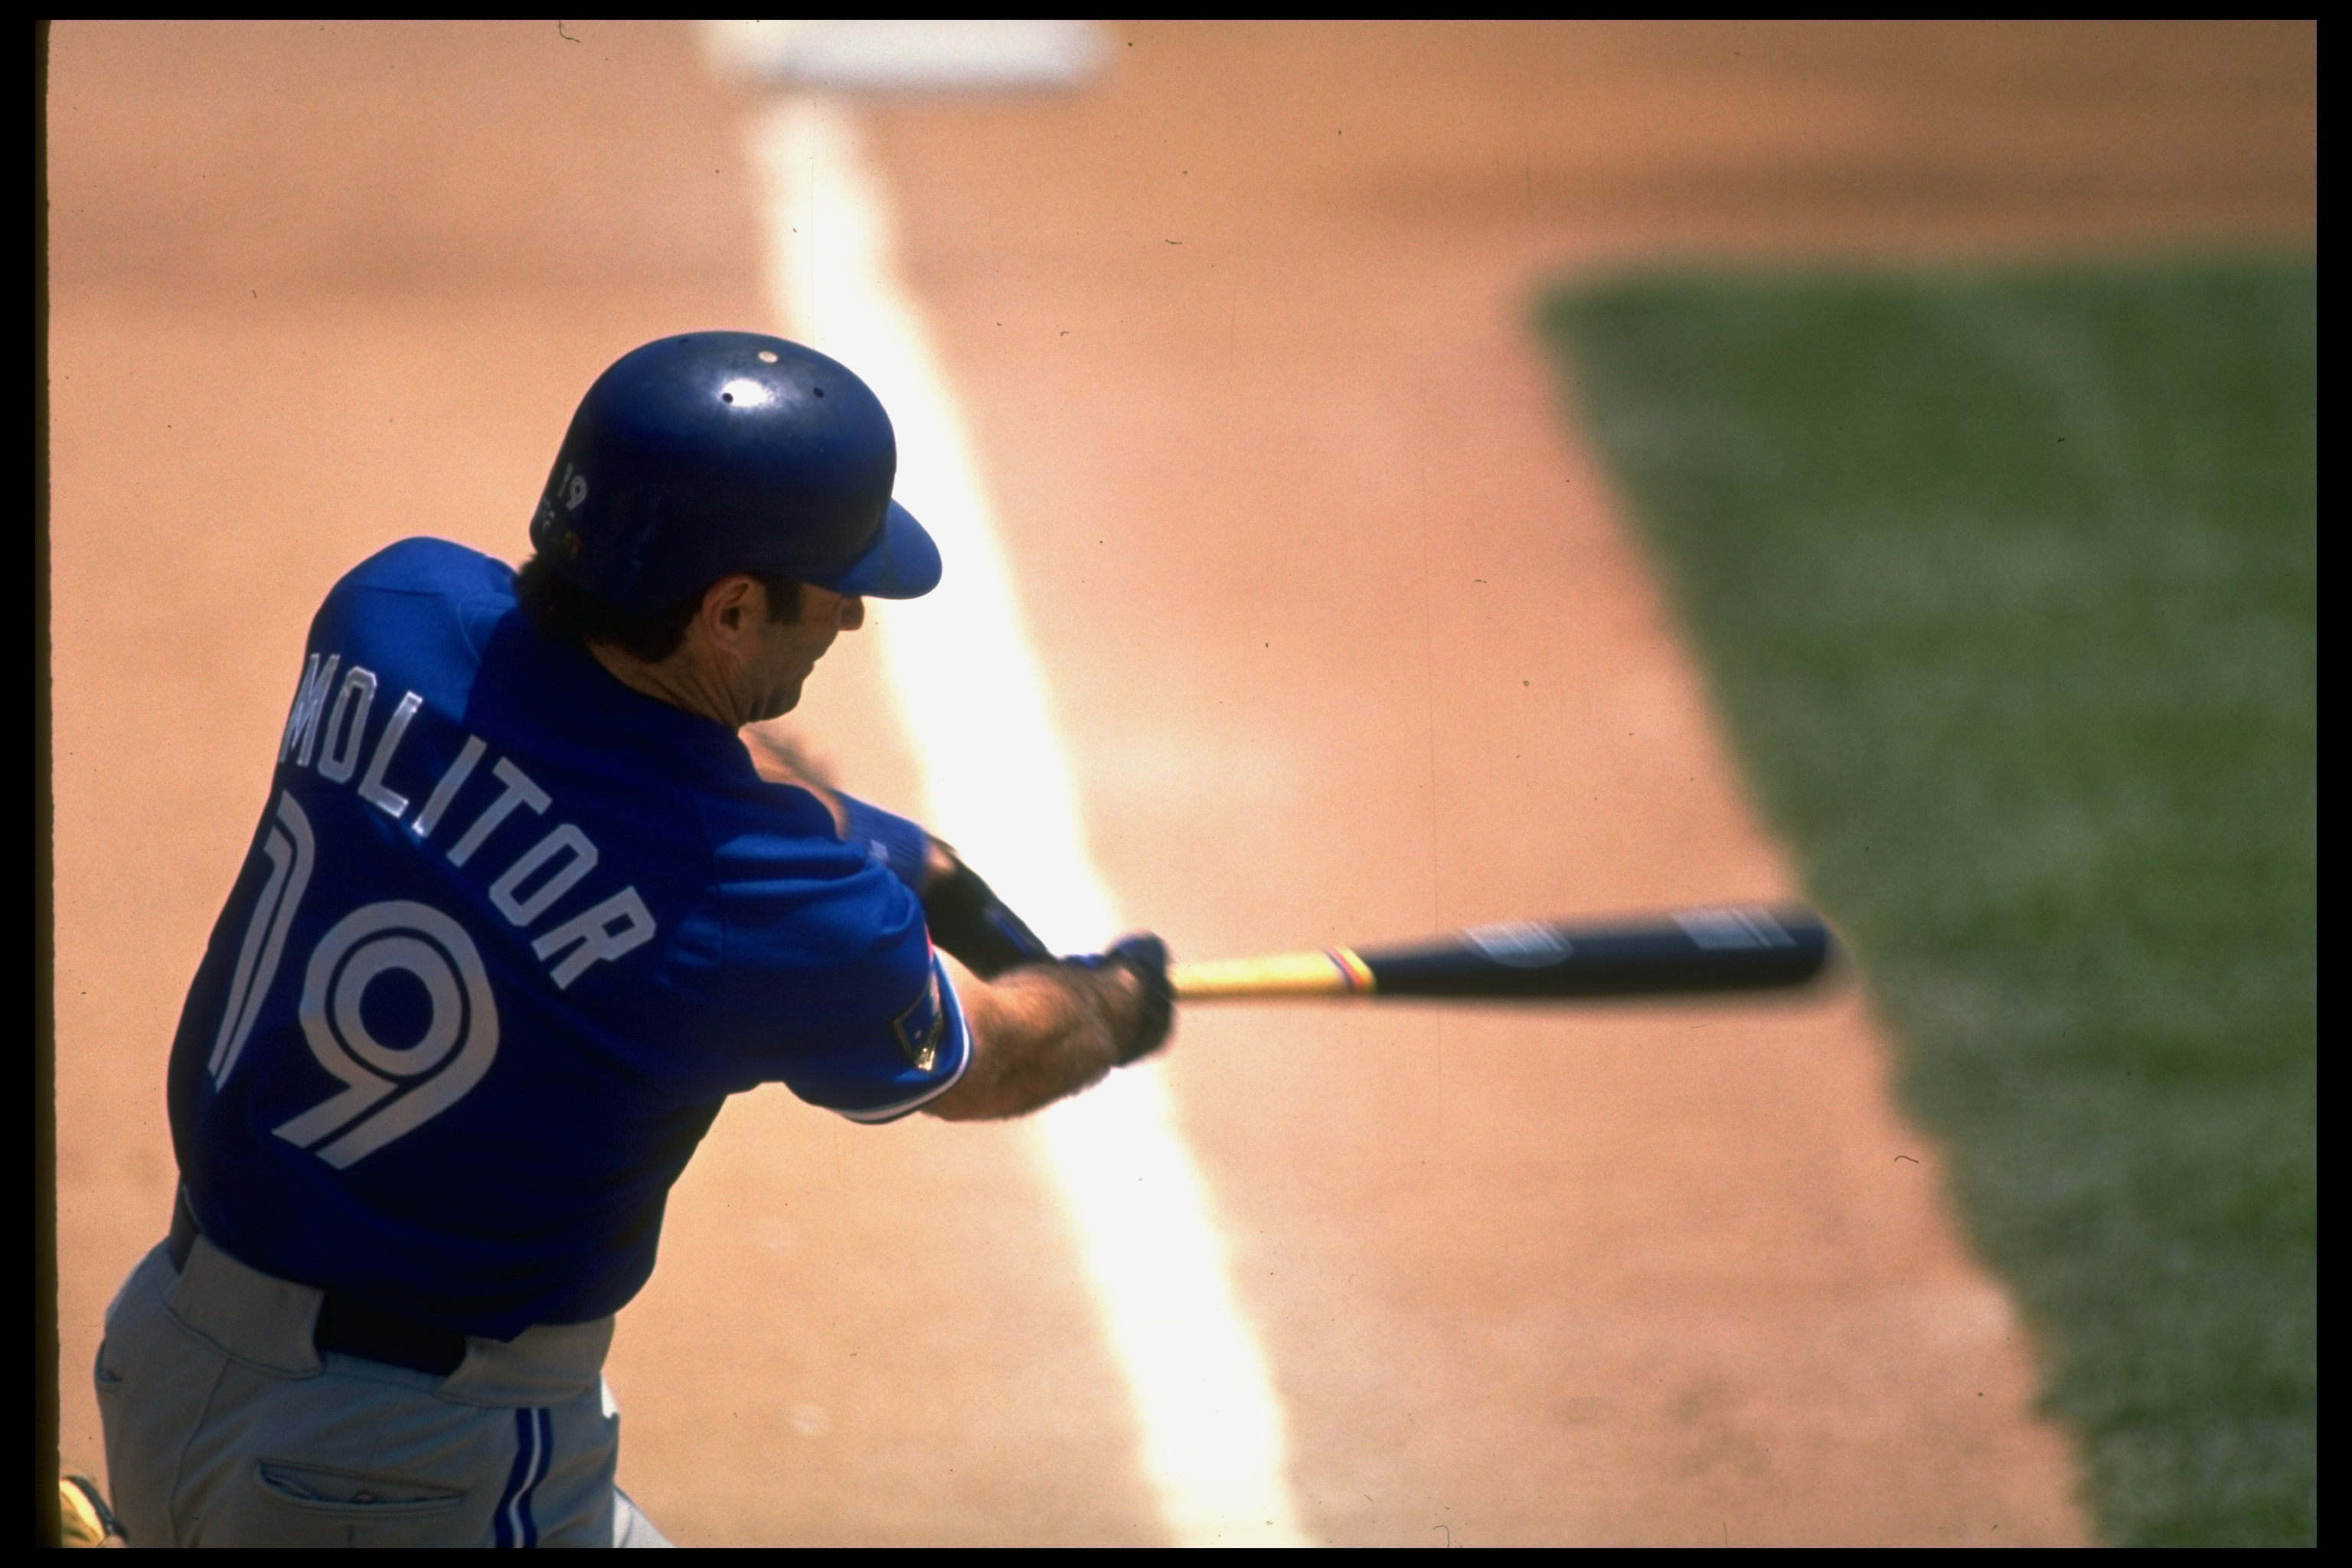 Baseball: Toronto Blue Jays Paul Molitor